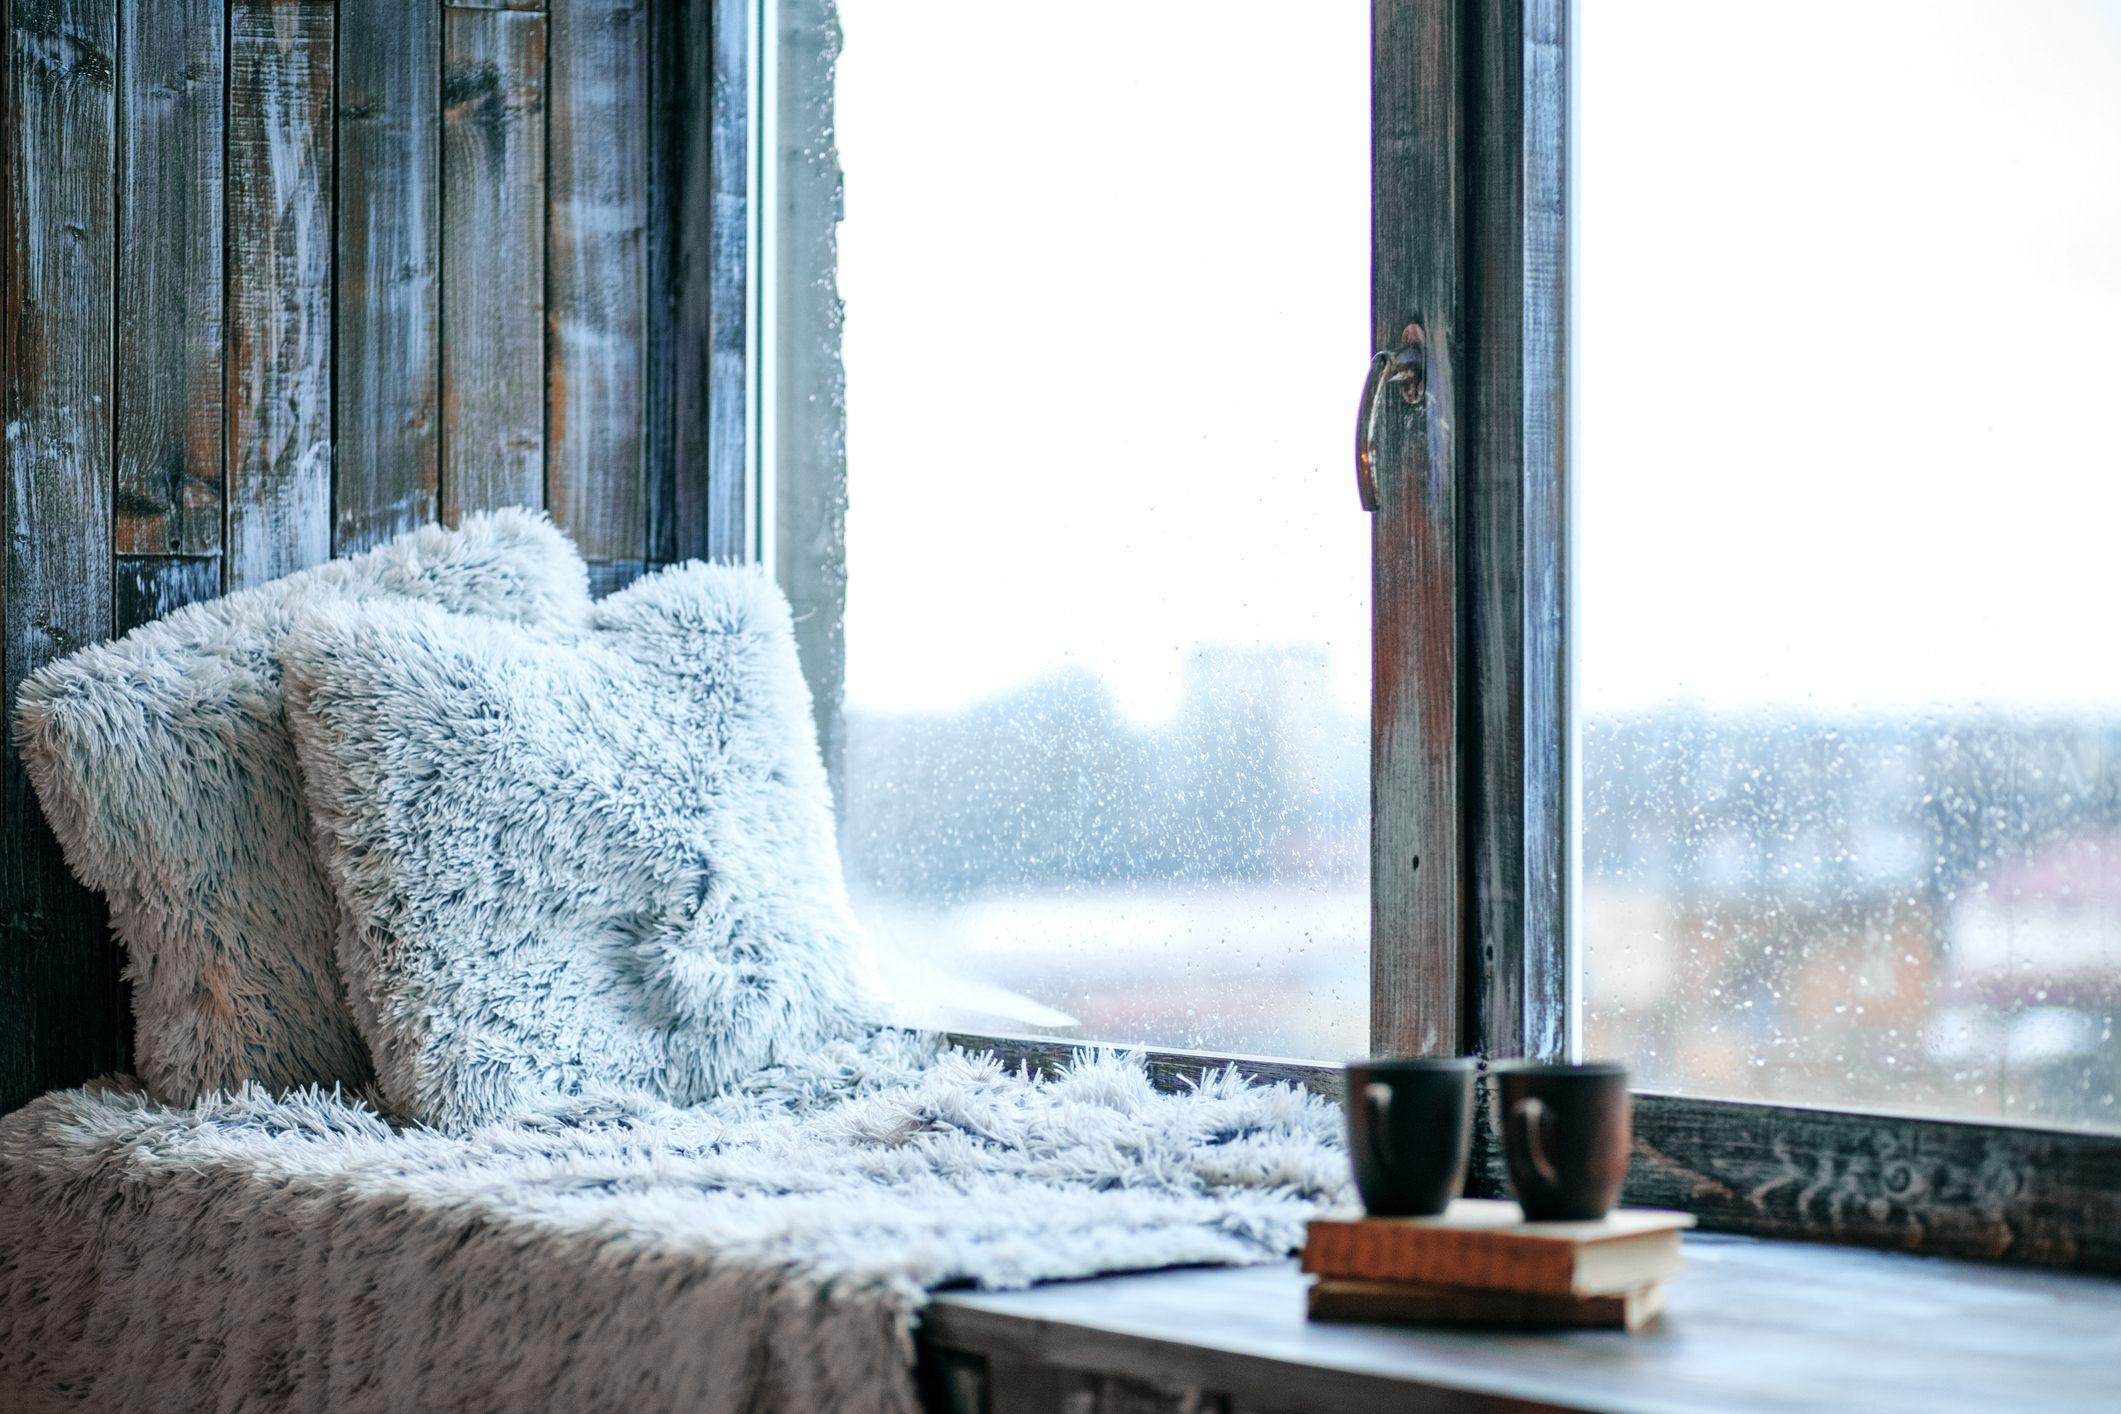 5 Creative Window Sill Decor Ideas - How to Decorate a Window Sill